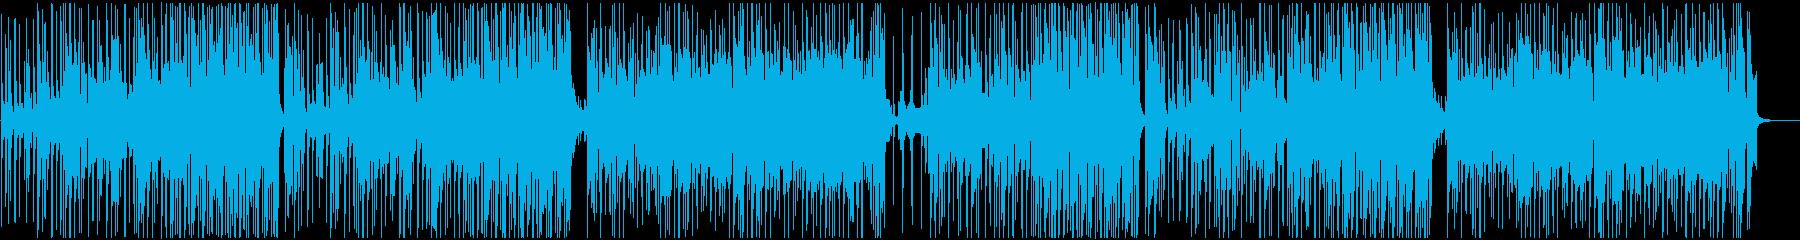 CM】レトロ風爽やかコーラスのBGMの再生済みの波形